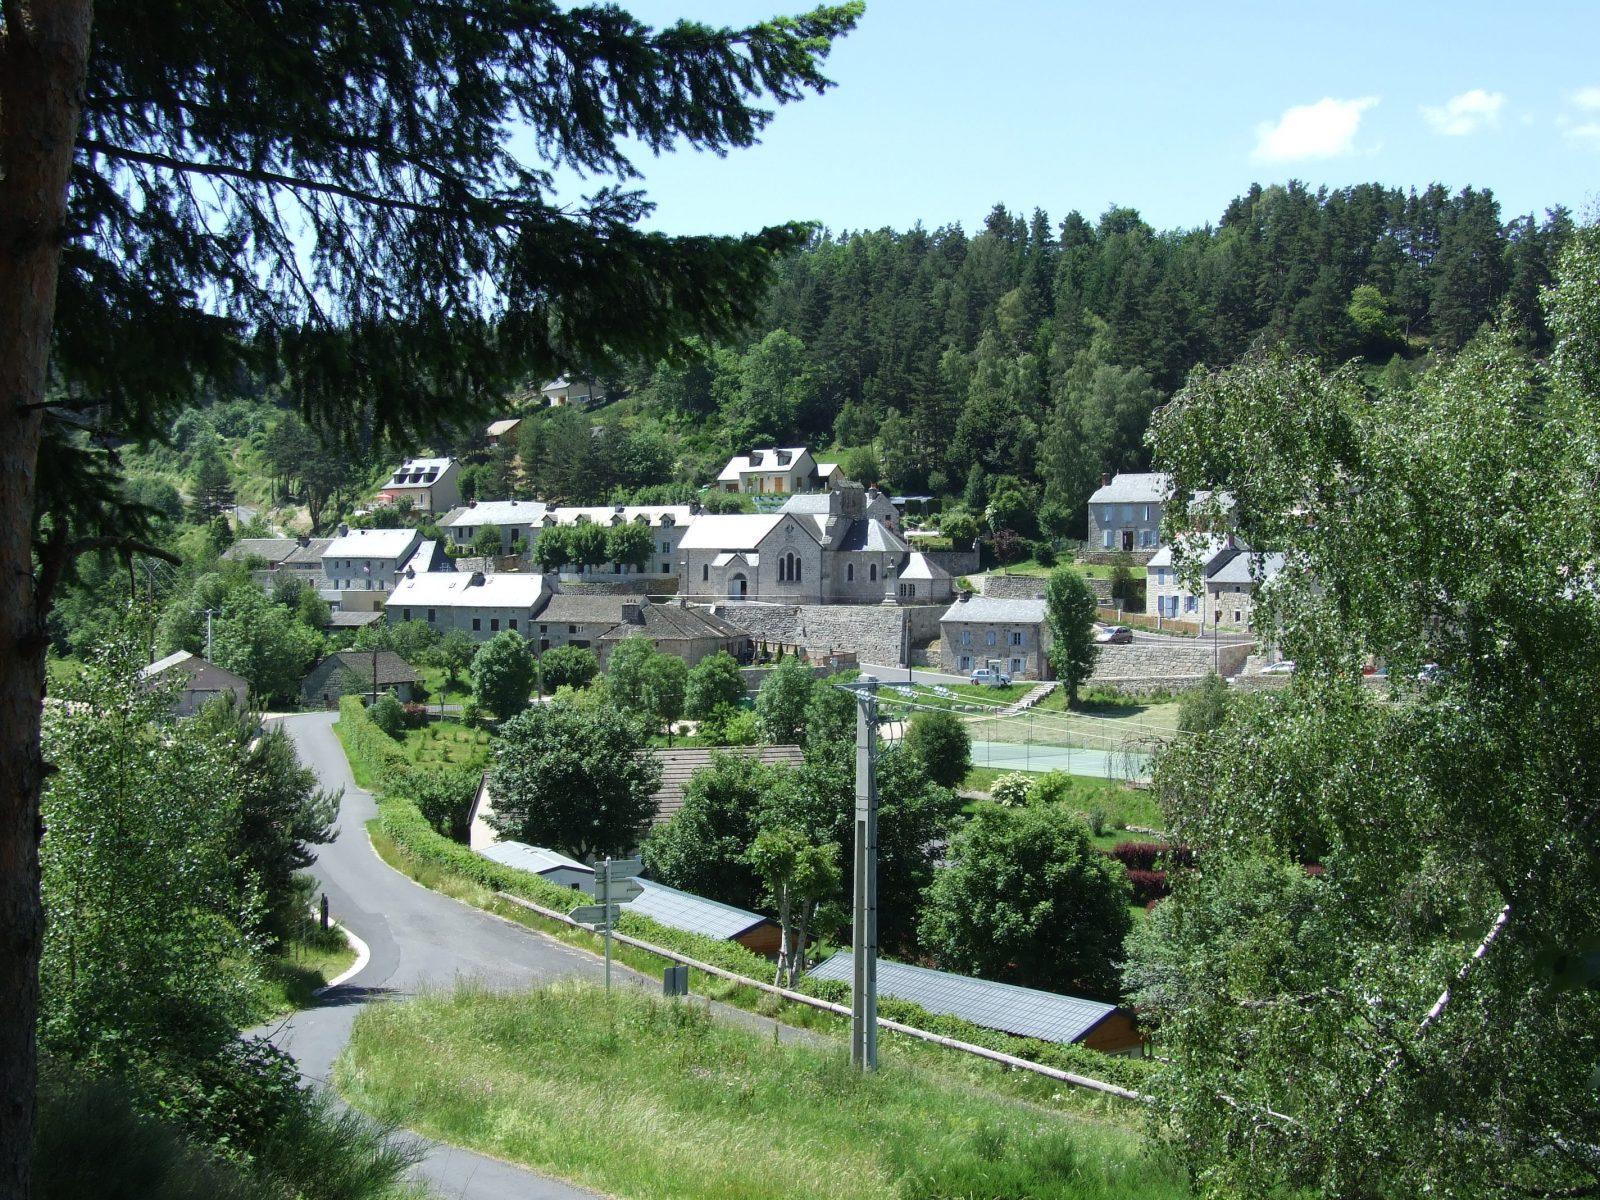 Camping municipal de Saint-Just-1